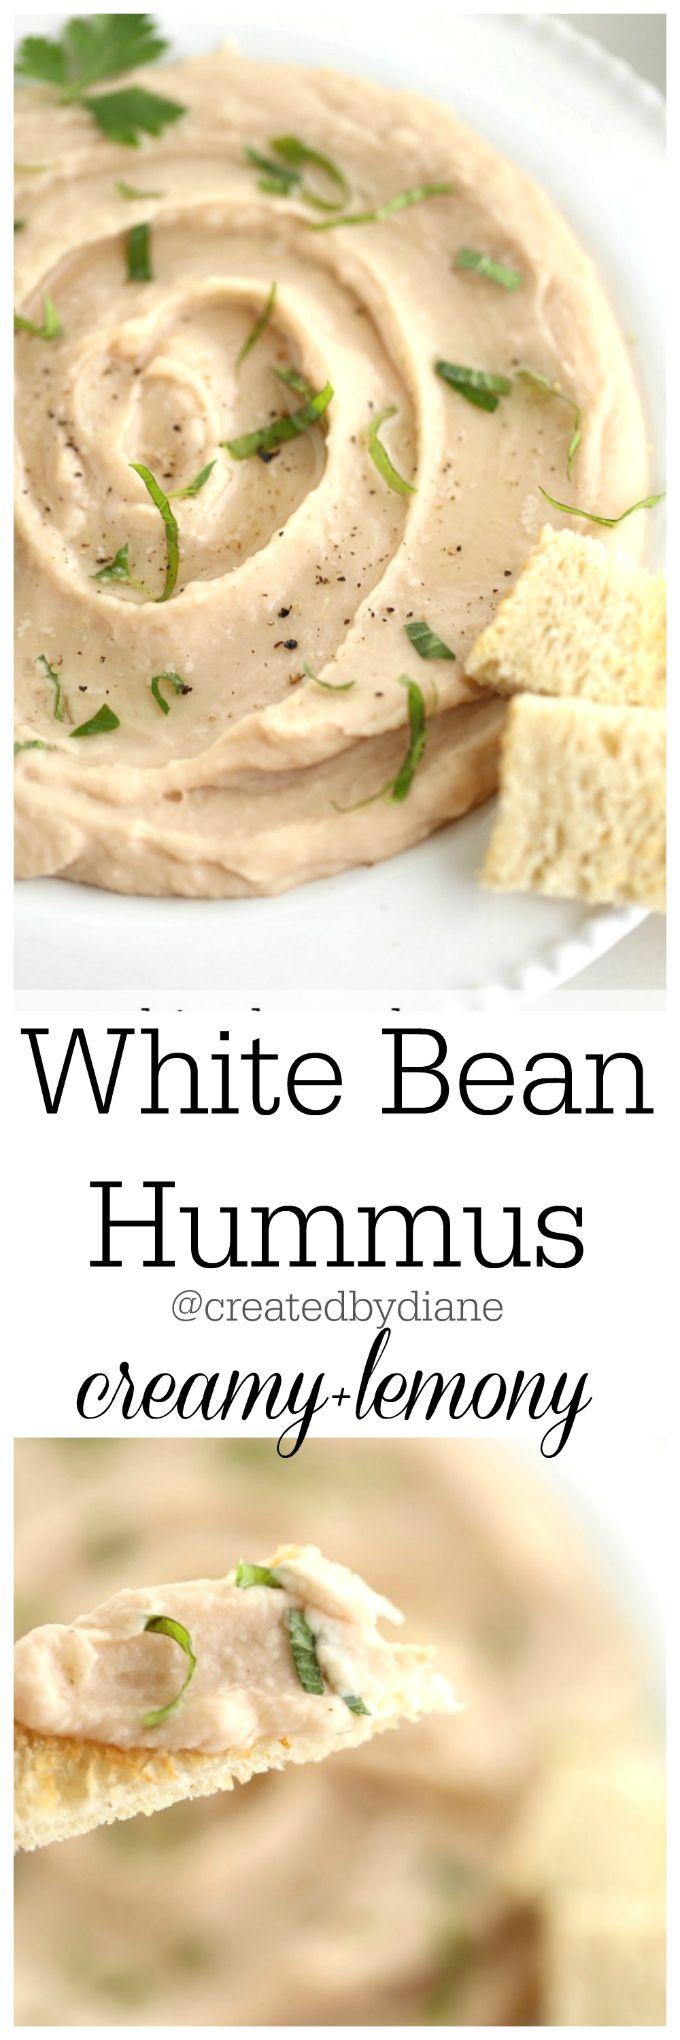 white bean hummus recipe lemony creamy @createdbydiane